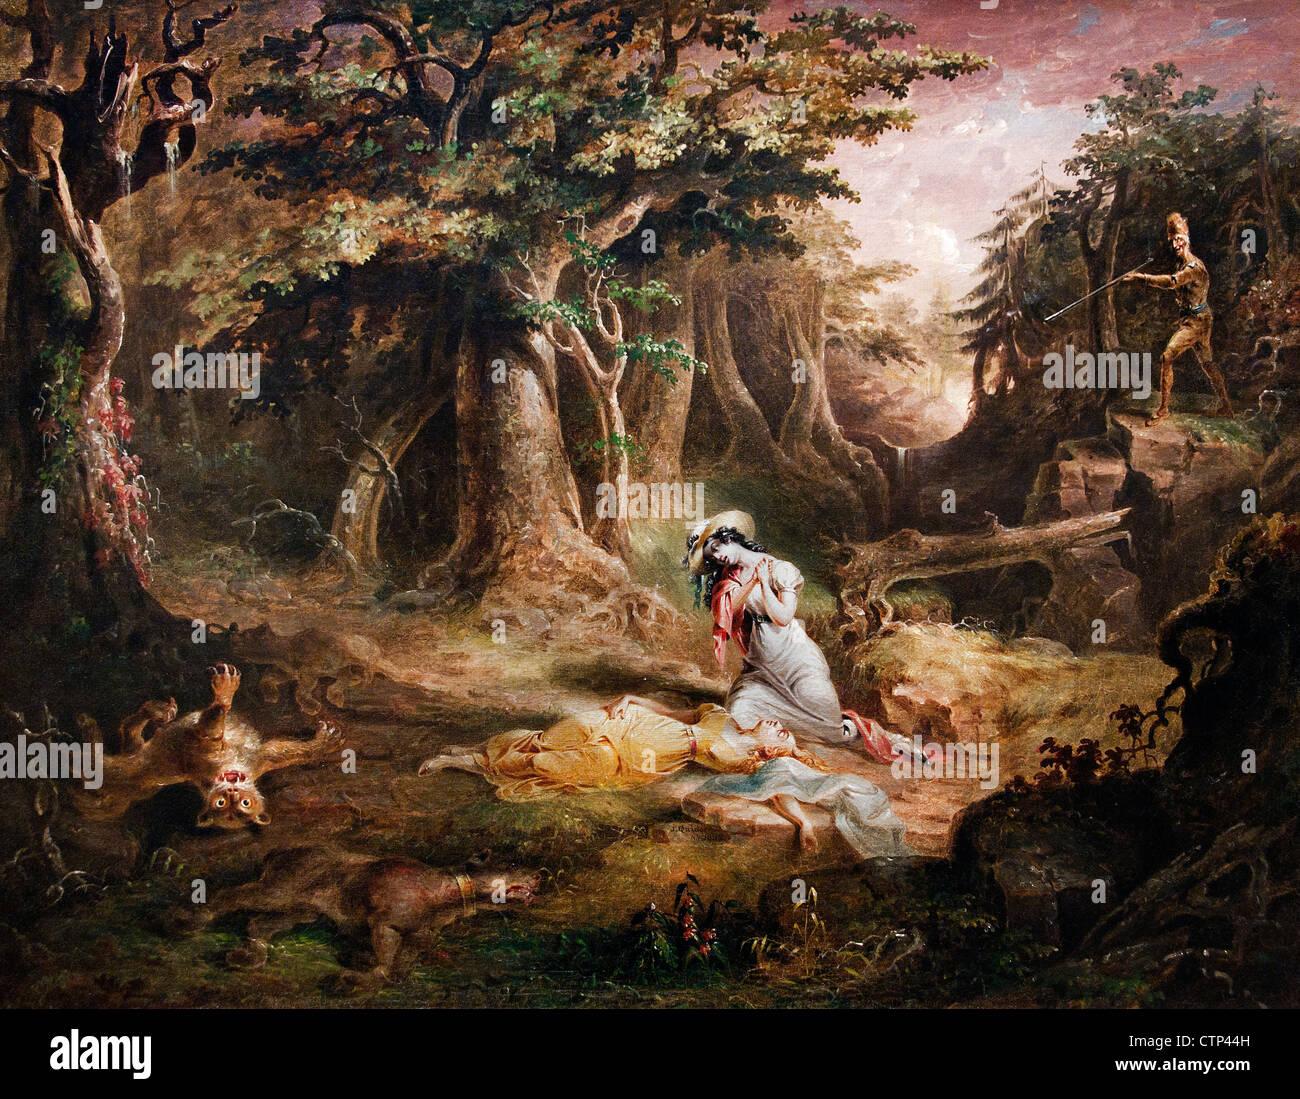 Sauvetage du Leatherstocking 1832 John Quidor American United States of America Banque D'Images